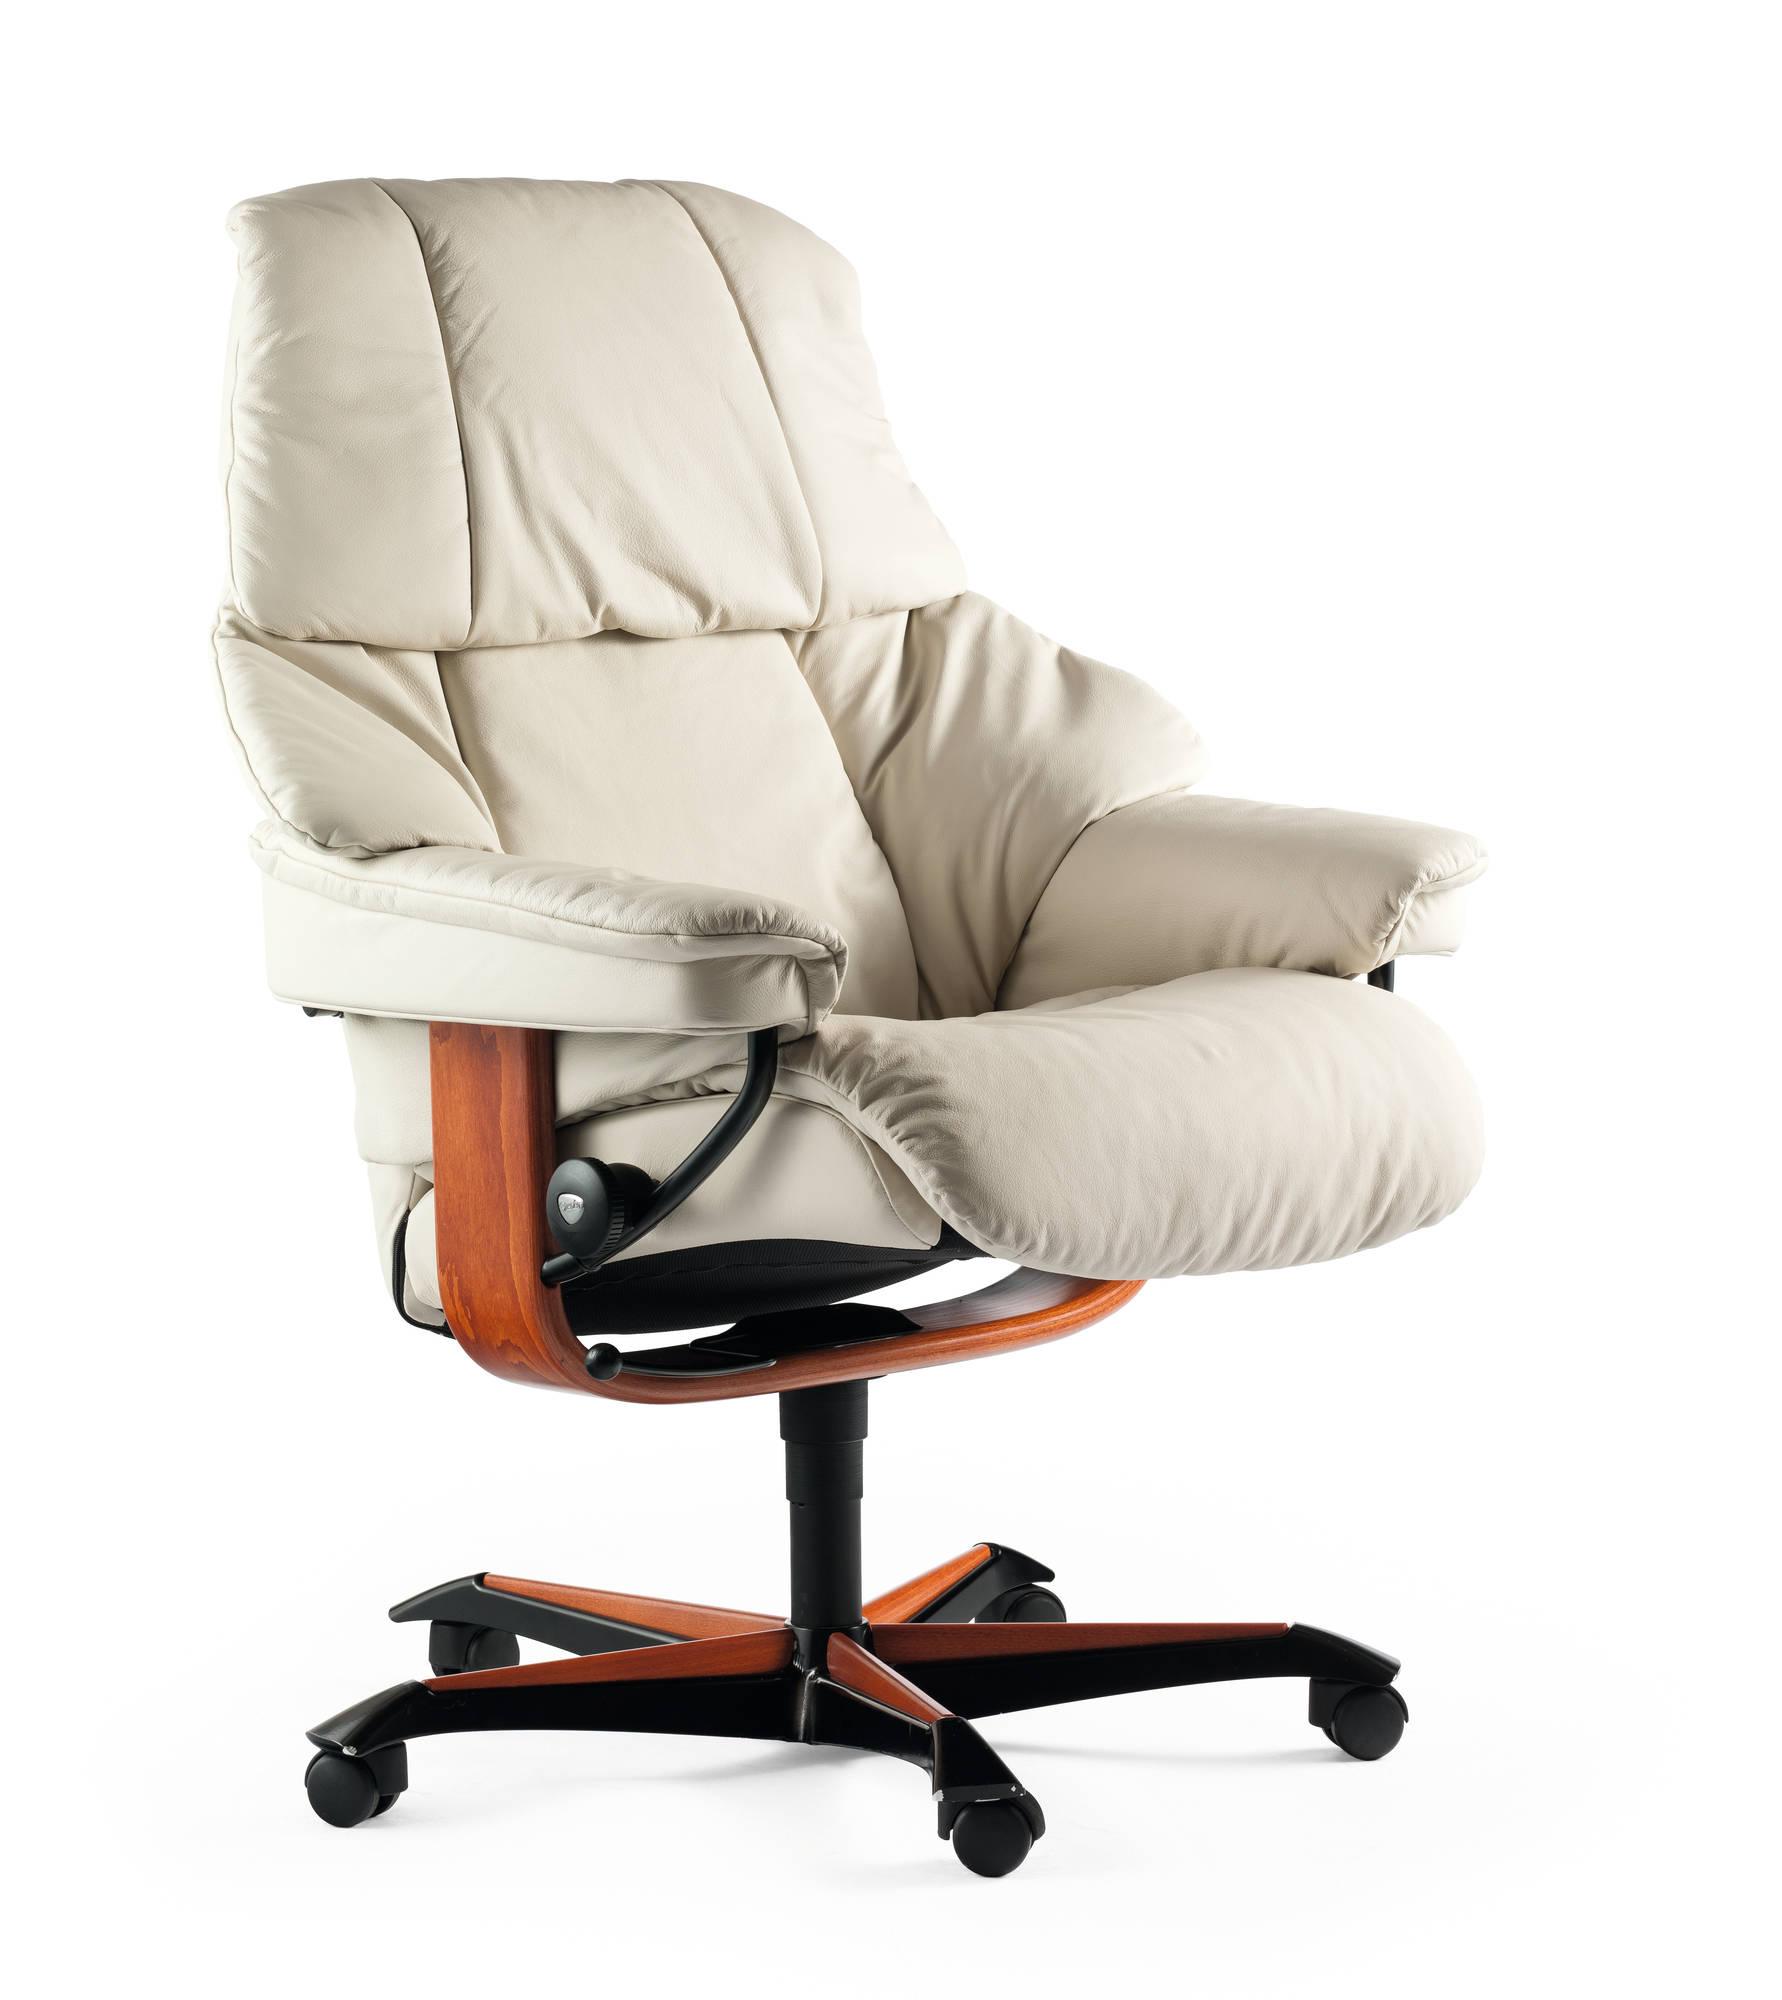 Reno Recliner Office Chair by Ekornes